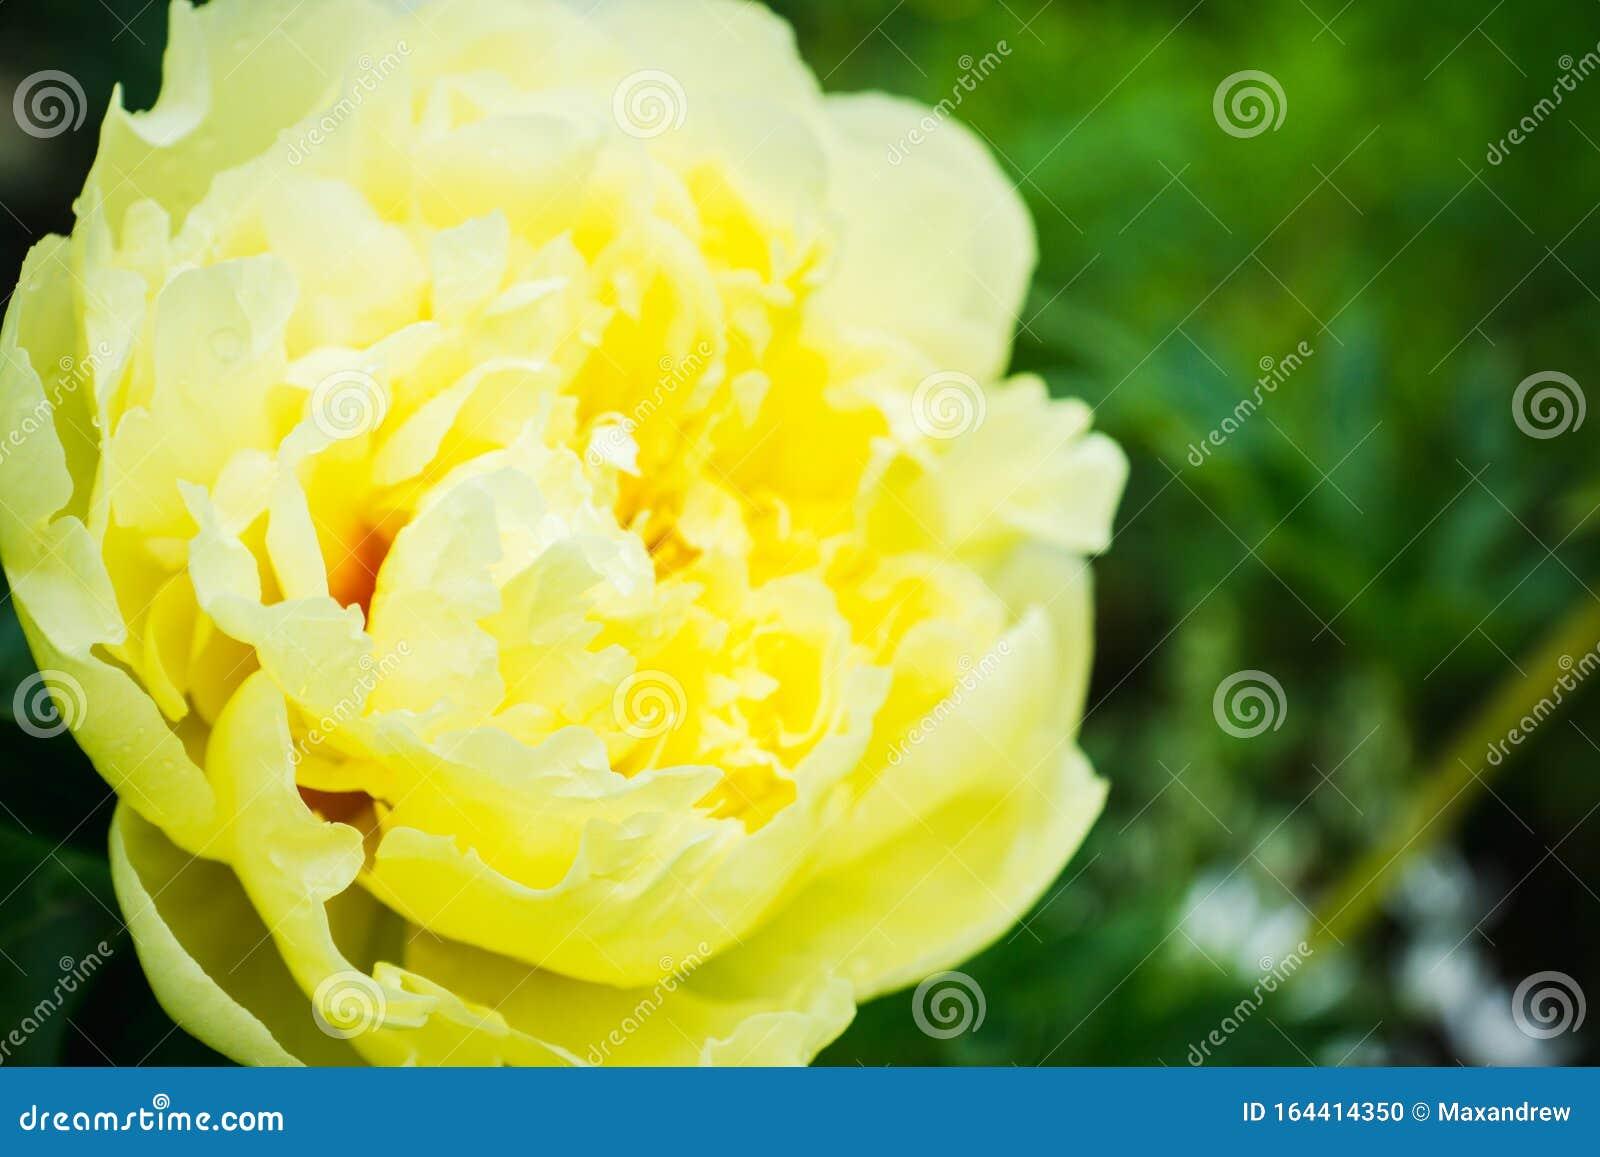 Blooming Yellow Peony Garden Treasure In The Garden Stock Photo